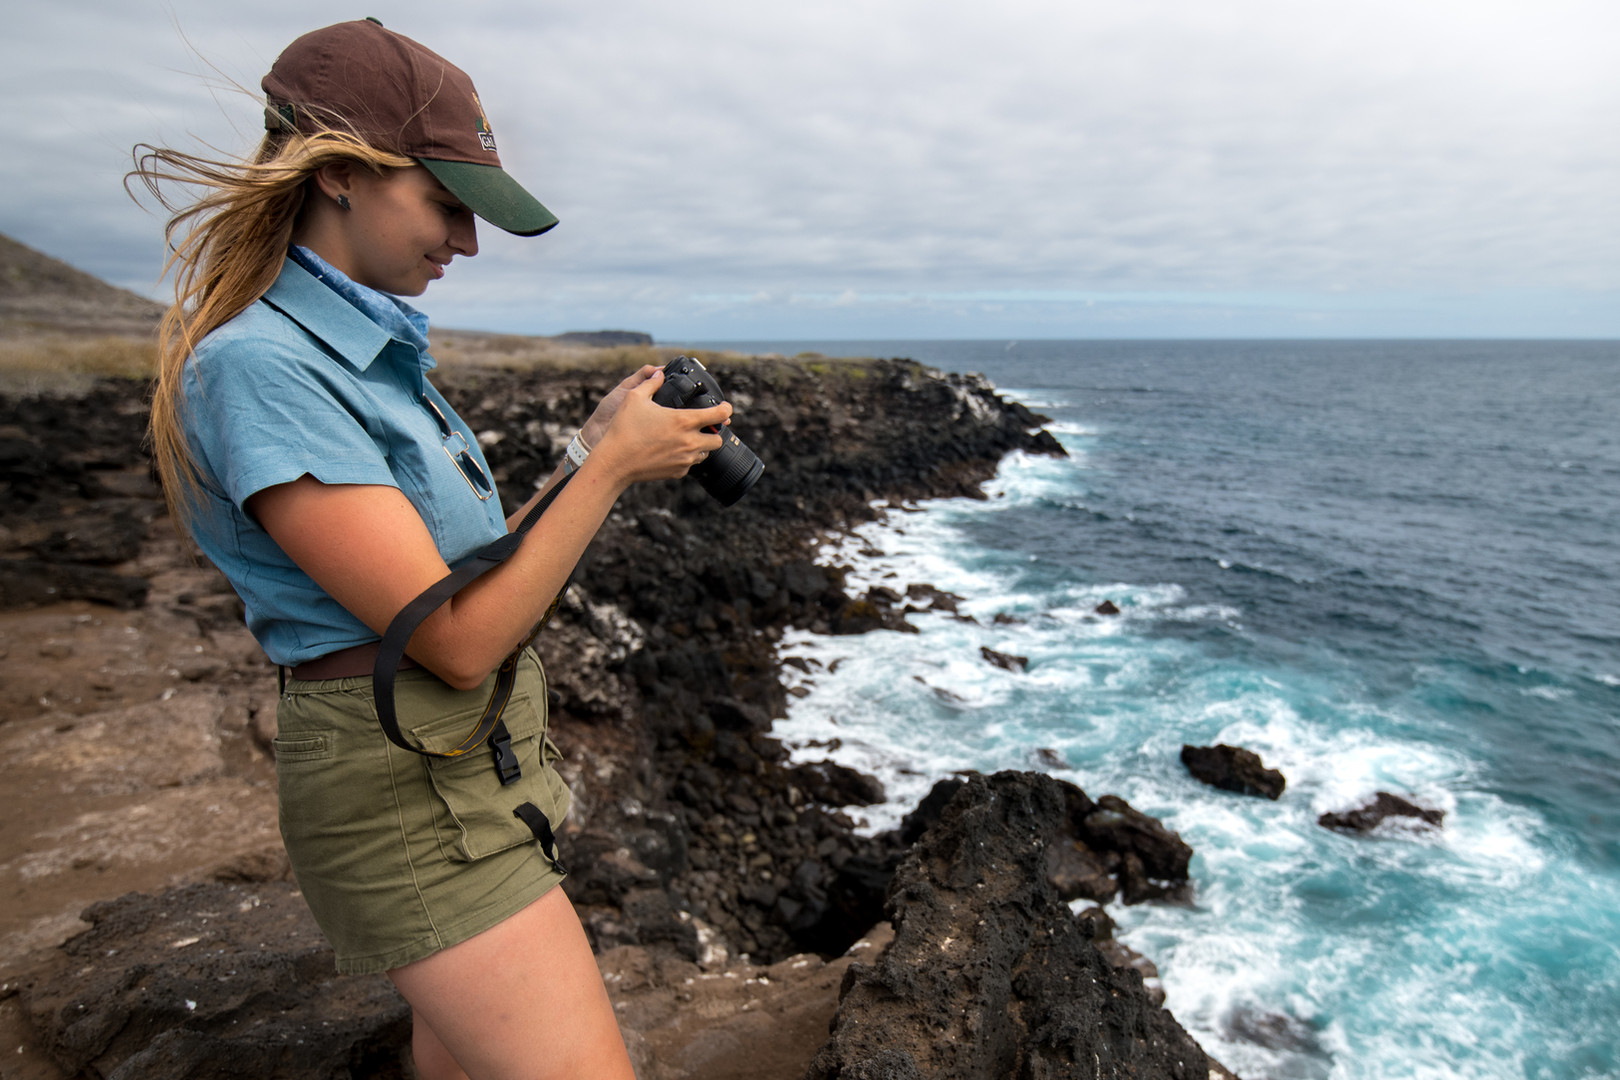 Berry photographing seabirds on San Cristobal, Galapagos.